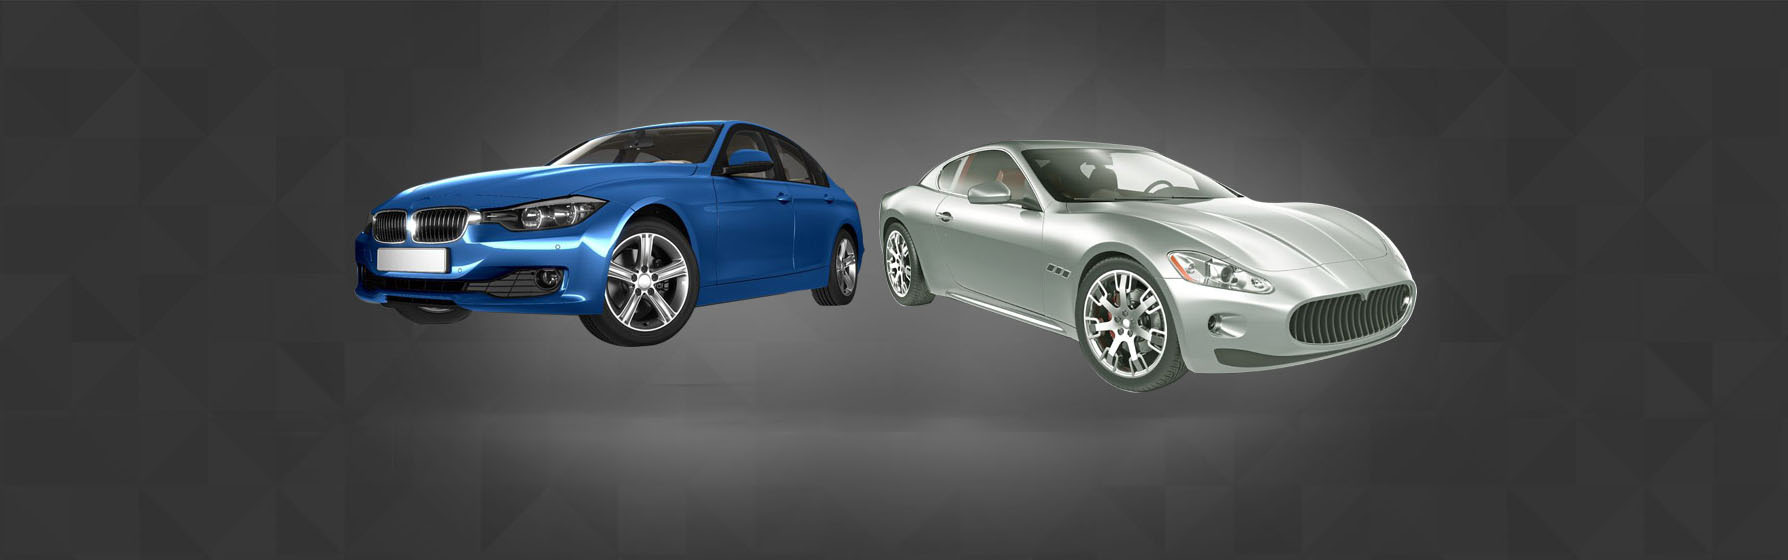 AUTOMOTIVE REPAIRS, DIAGNOSTICS & MAINTENANCE